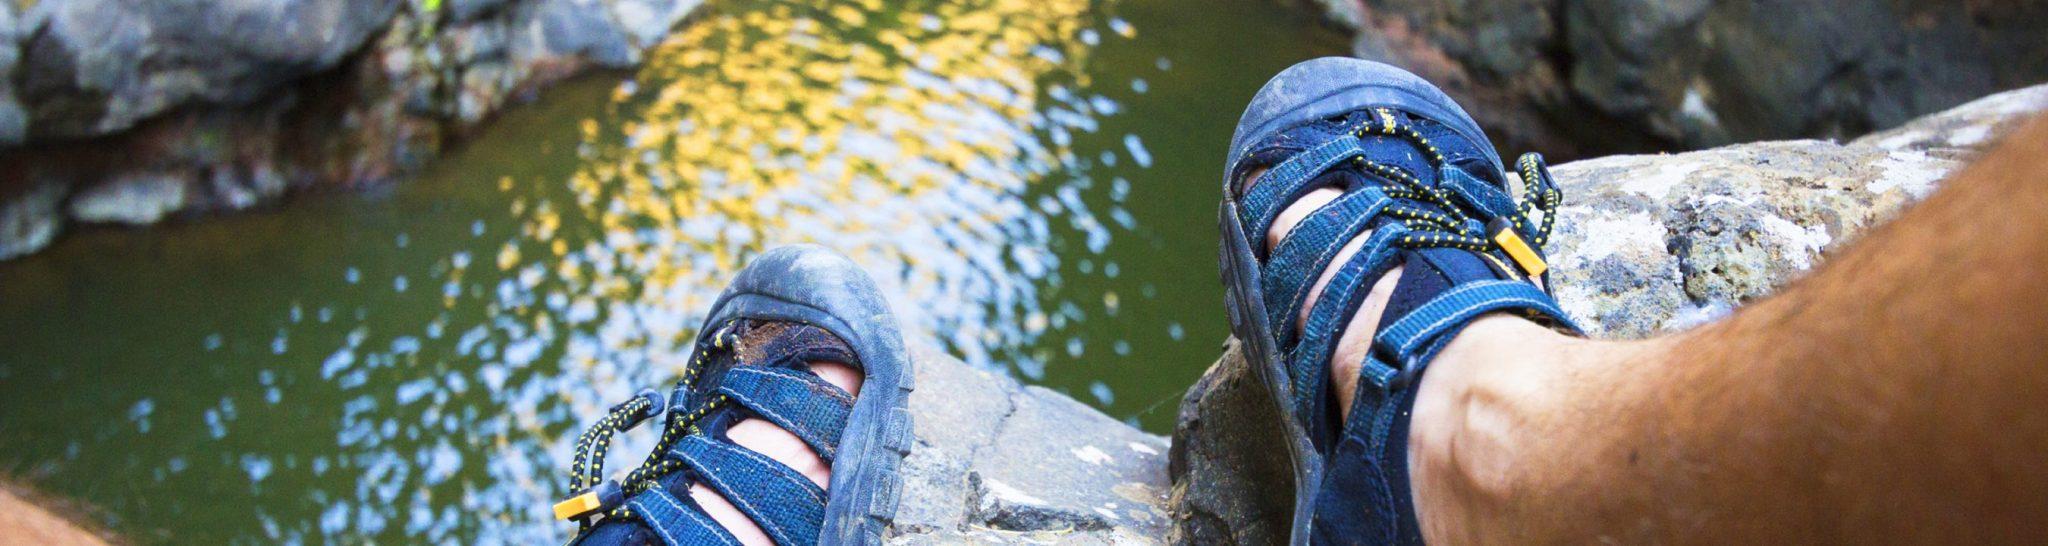 Best Shoes Kayaking New Zealand Header